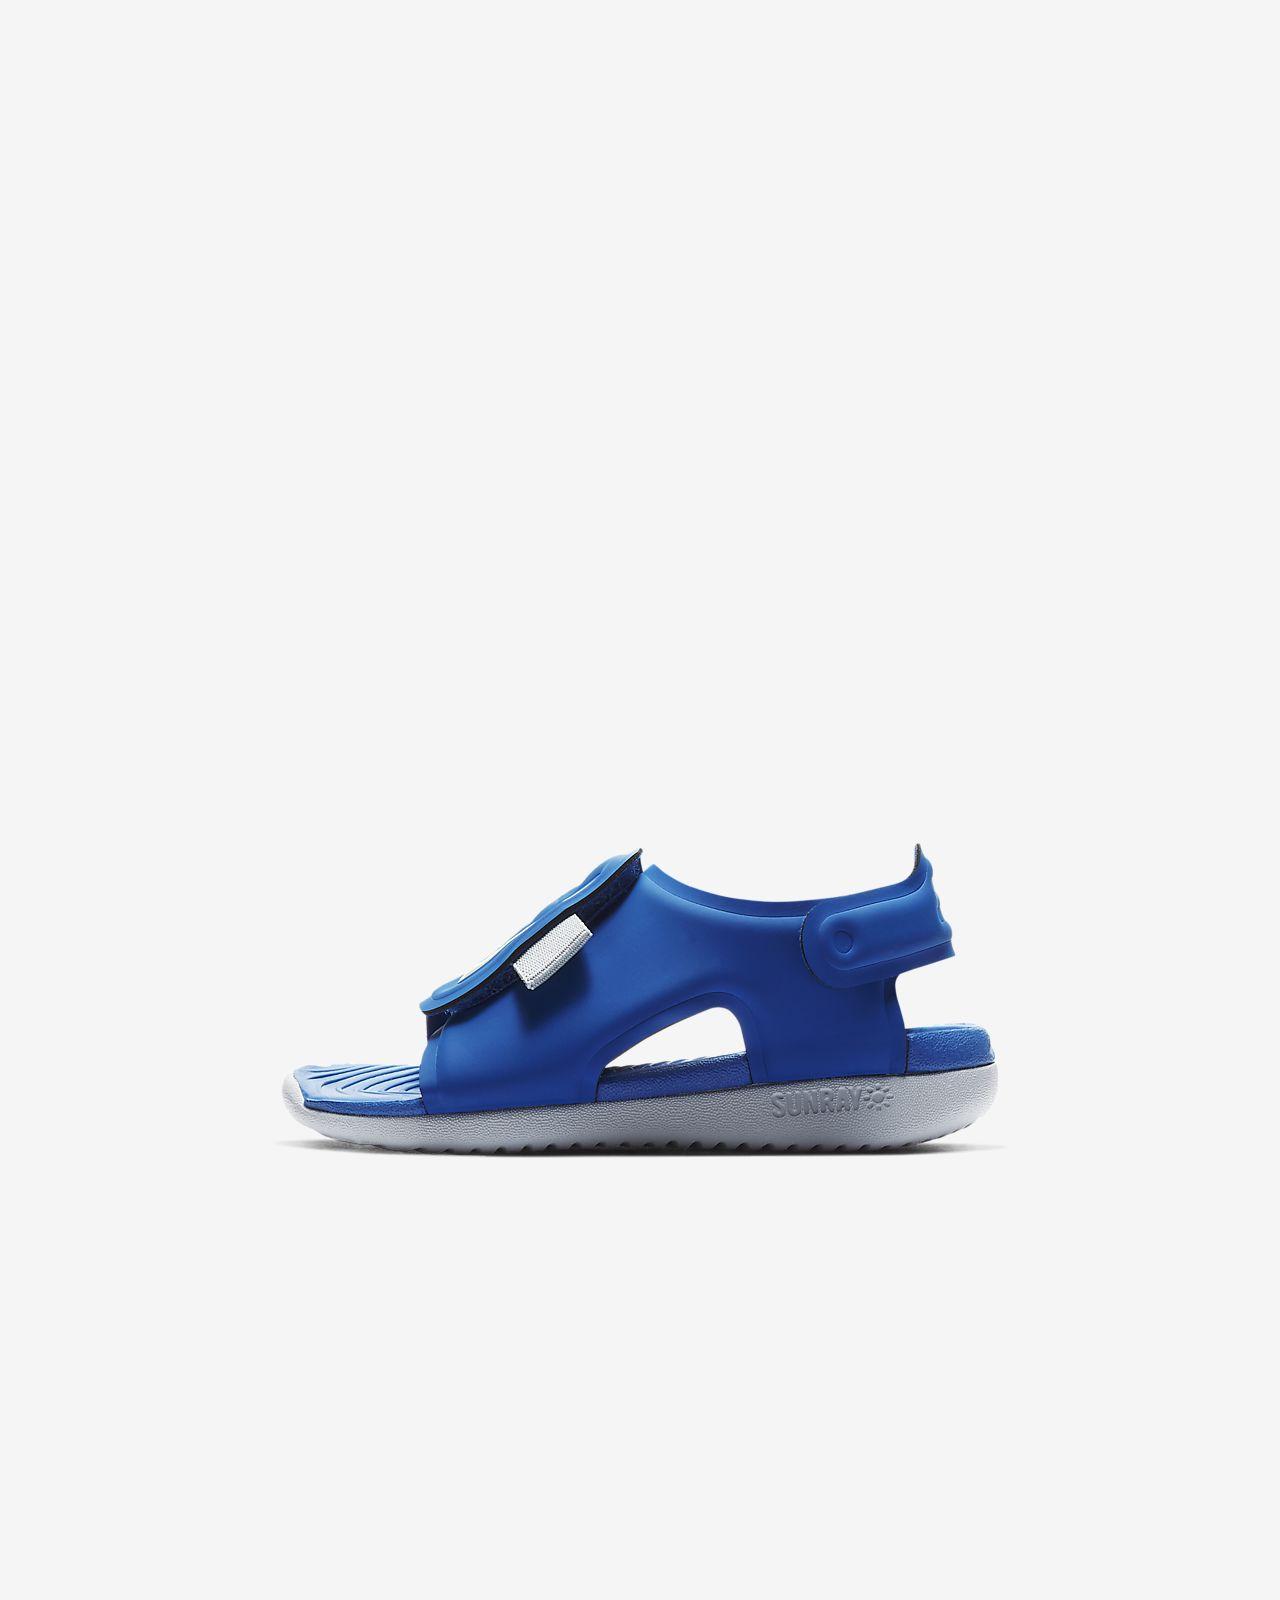 49856541b69e Sandale Nike Sunray Adjust 5 pour Bébé Petit enfant. Nike.com BE